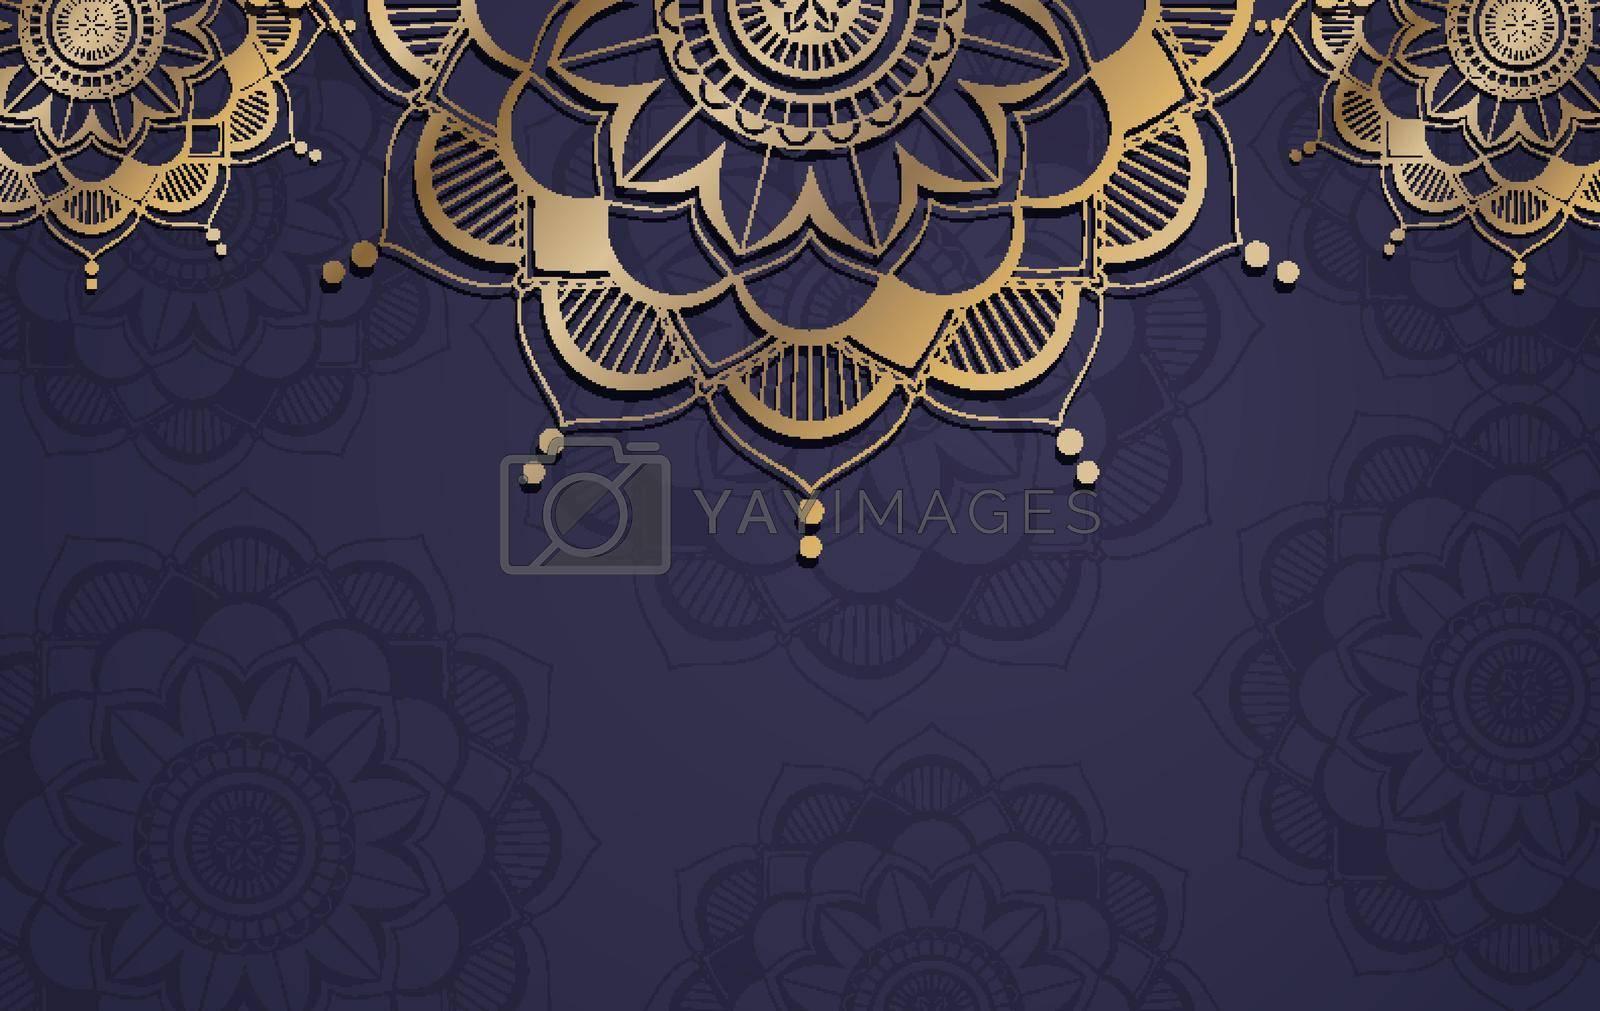 Background template with mandala pattern design illustration